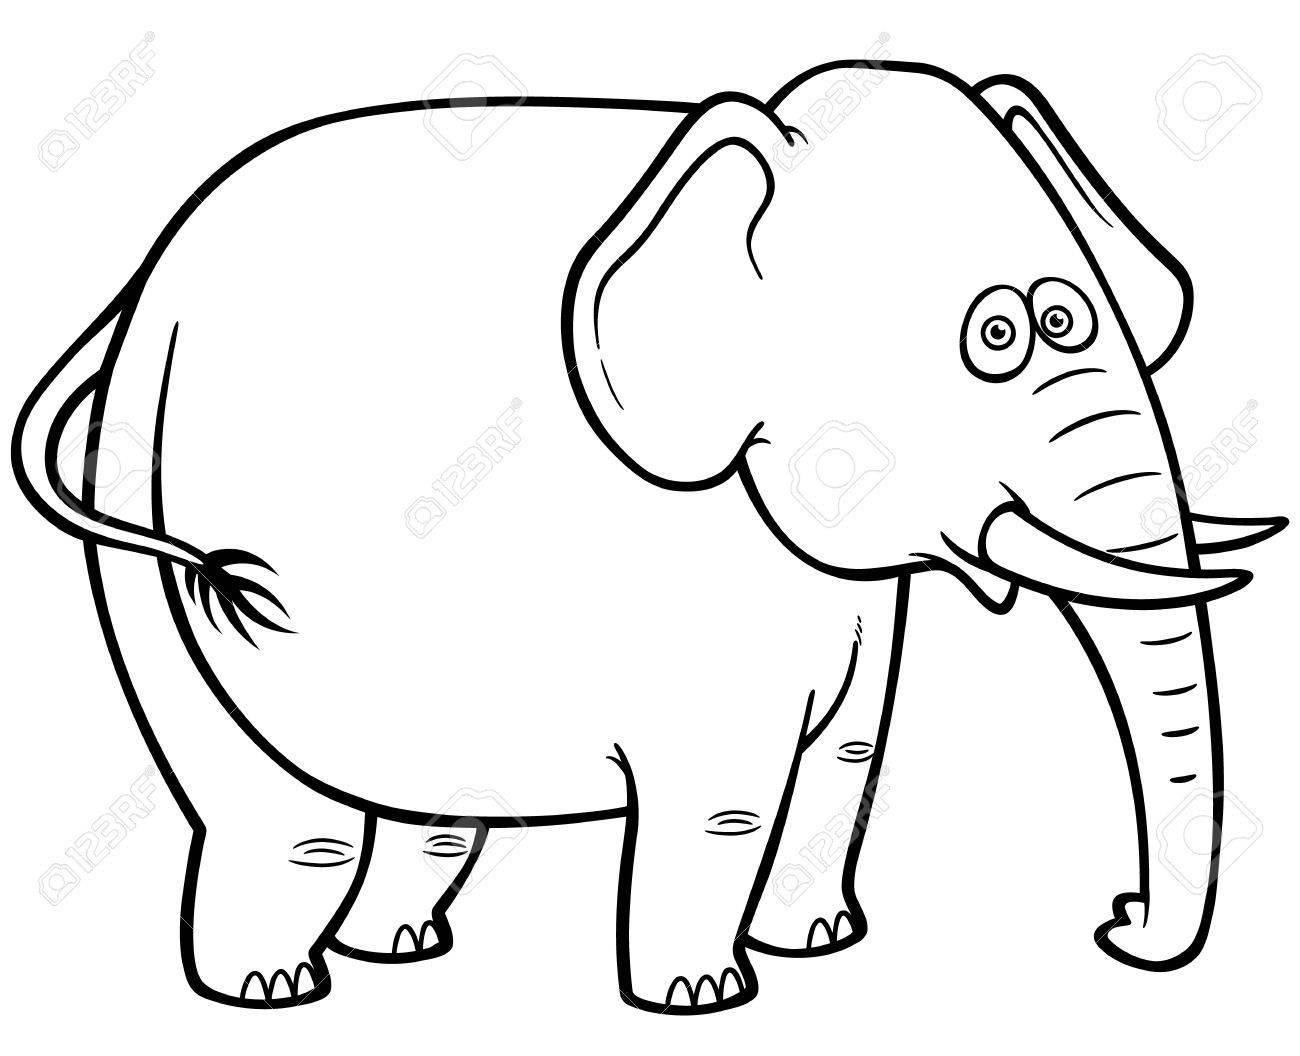 vector illustration of cartoon elephant coloring book stock vector 27321976 - Elephant Coloring Book